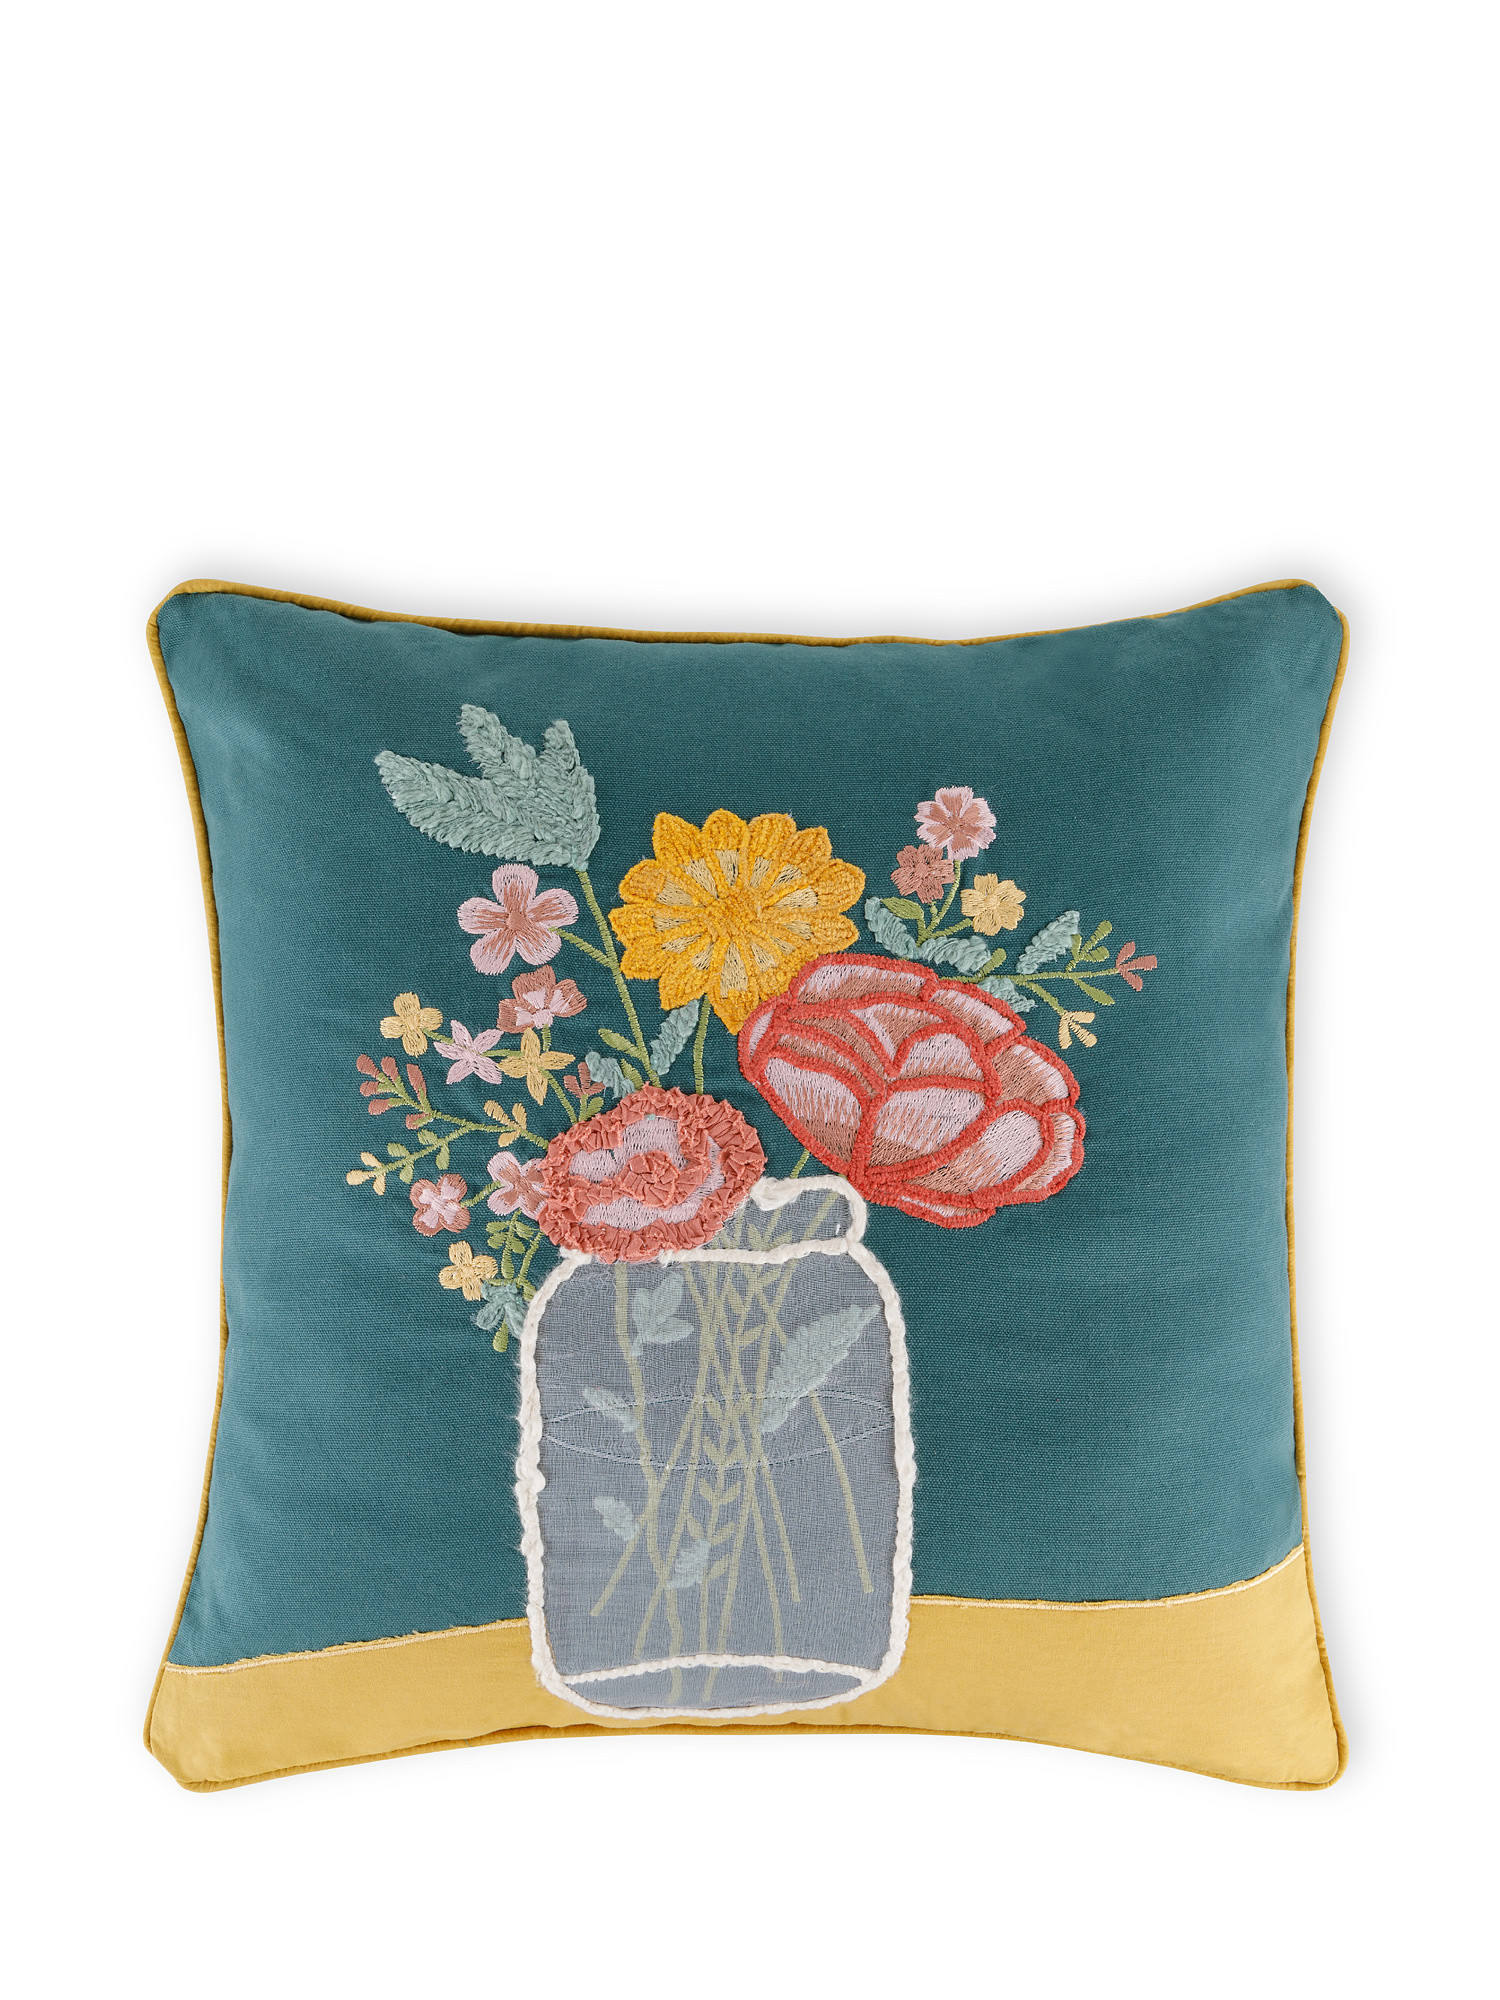 Cuscino cotone ricamo vaso 45x45cm, Multicolor, large image number 0